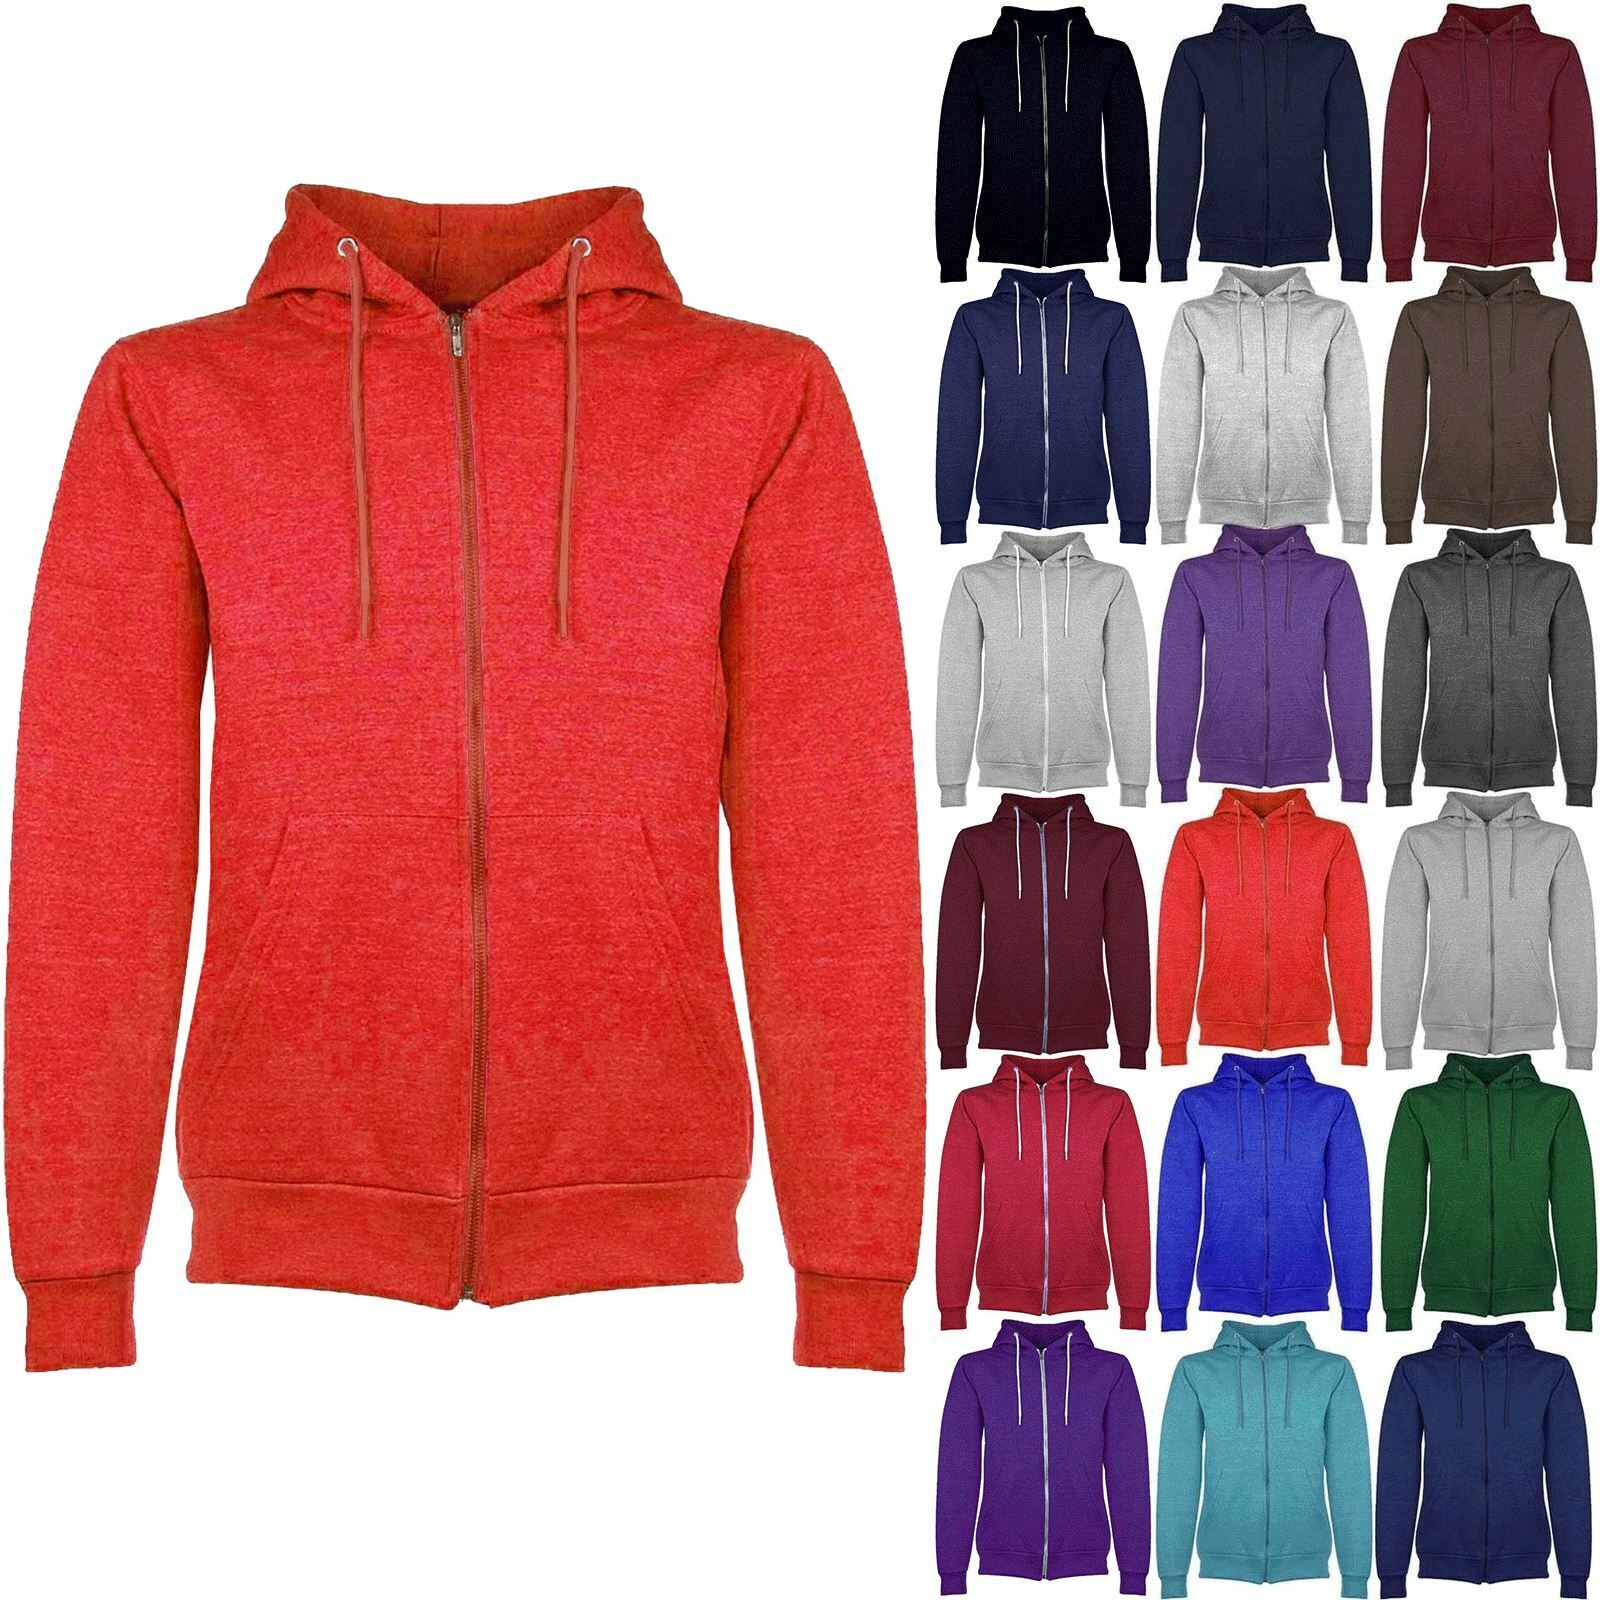 Mens Plain Hooded Hoodies Hoody American Fleece Zip Jacket Sweat Shirt Top